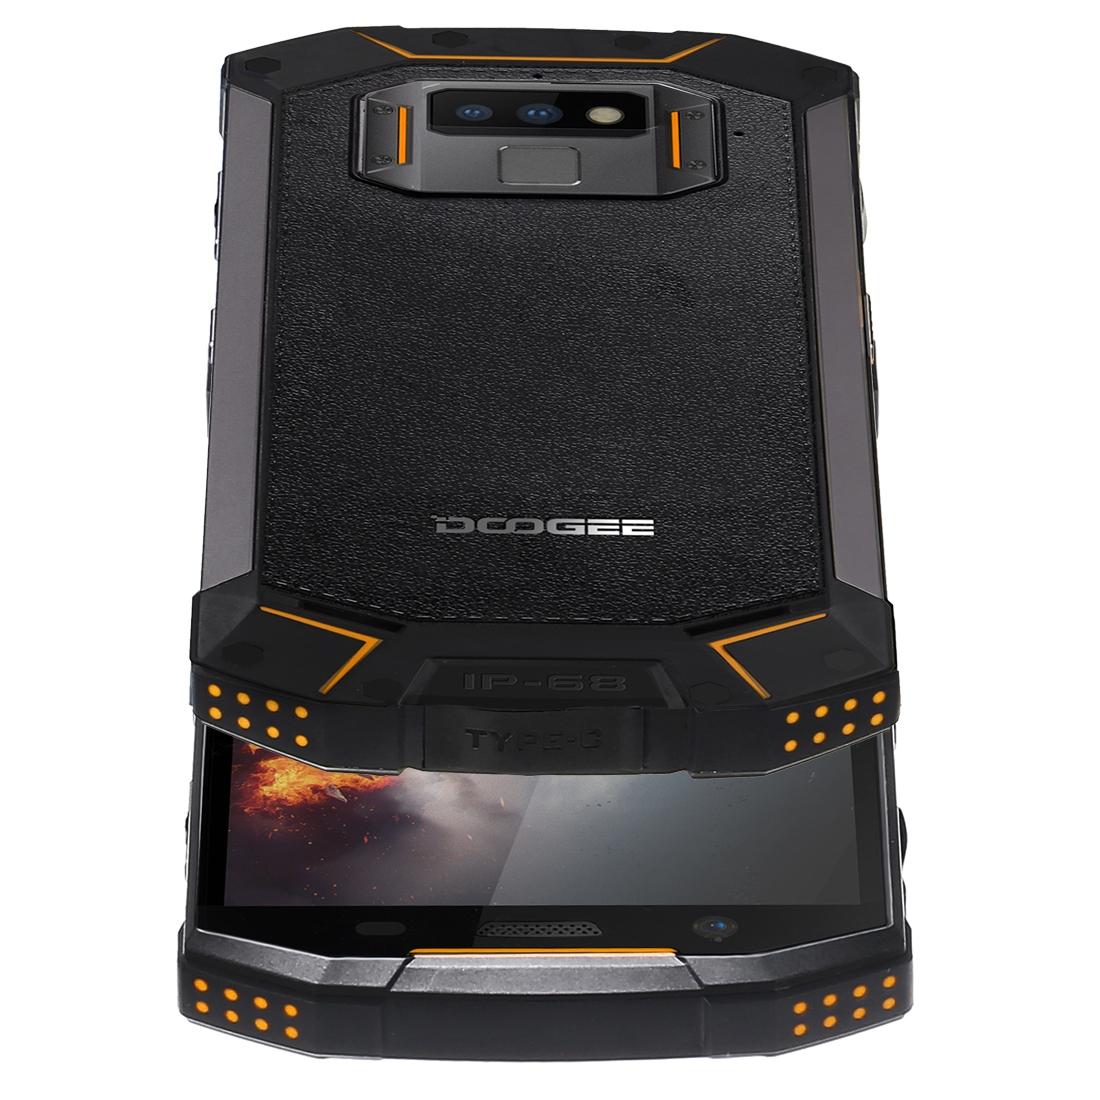 Проектор Смартфон DOOGEE S70 6GB+64GB Защита от влаги пыли ударов по стандарту IP68/IP69K MIL-STD-810G 5500мАч батарея Двойная камера (Фото 2)